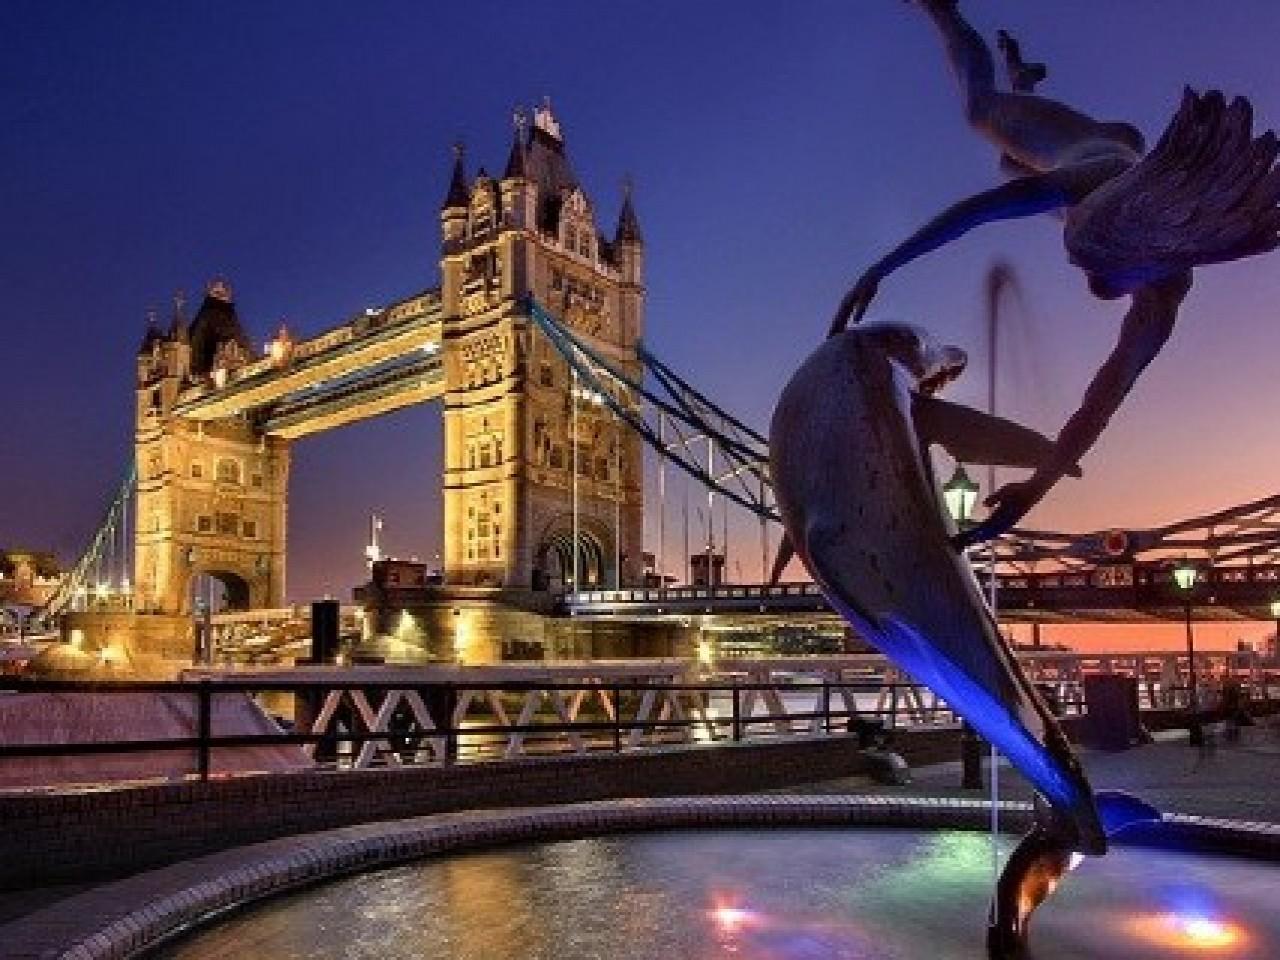 Londra +2370 hotel